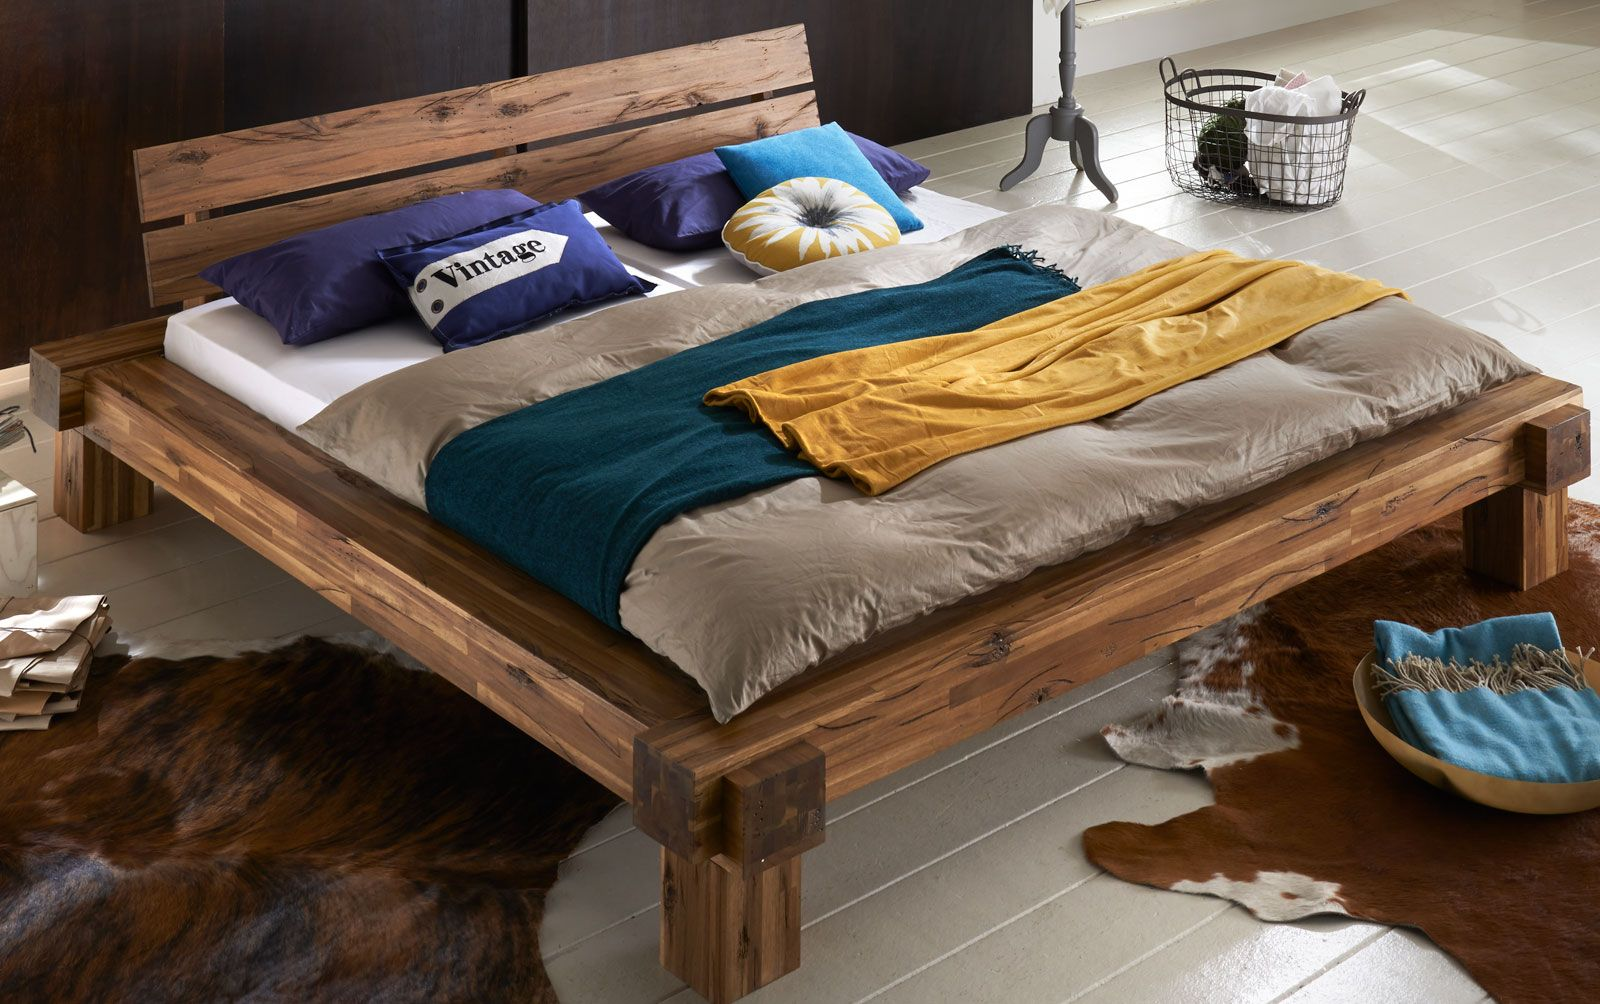 balkenbett - Google-haku | Sängyt | Bett, Bett holz und ...